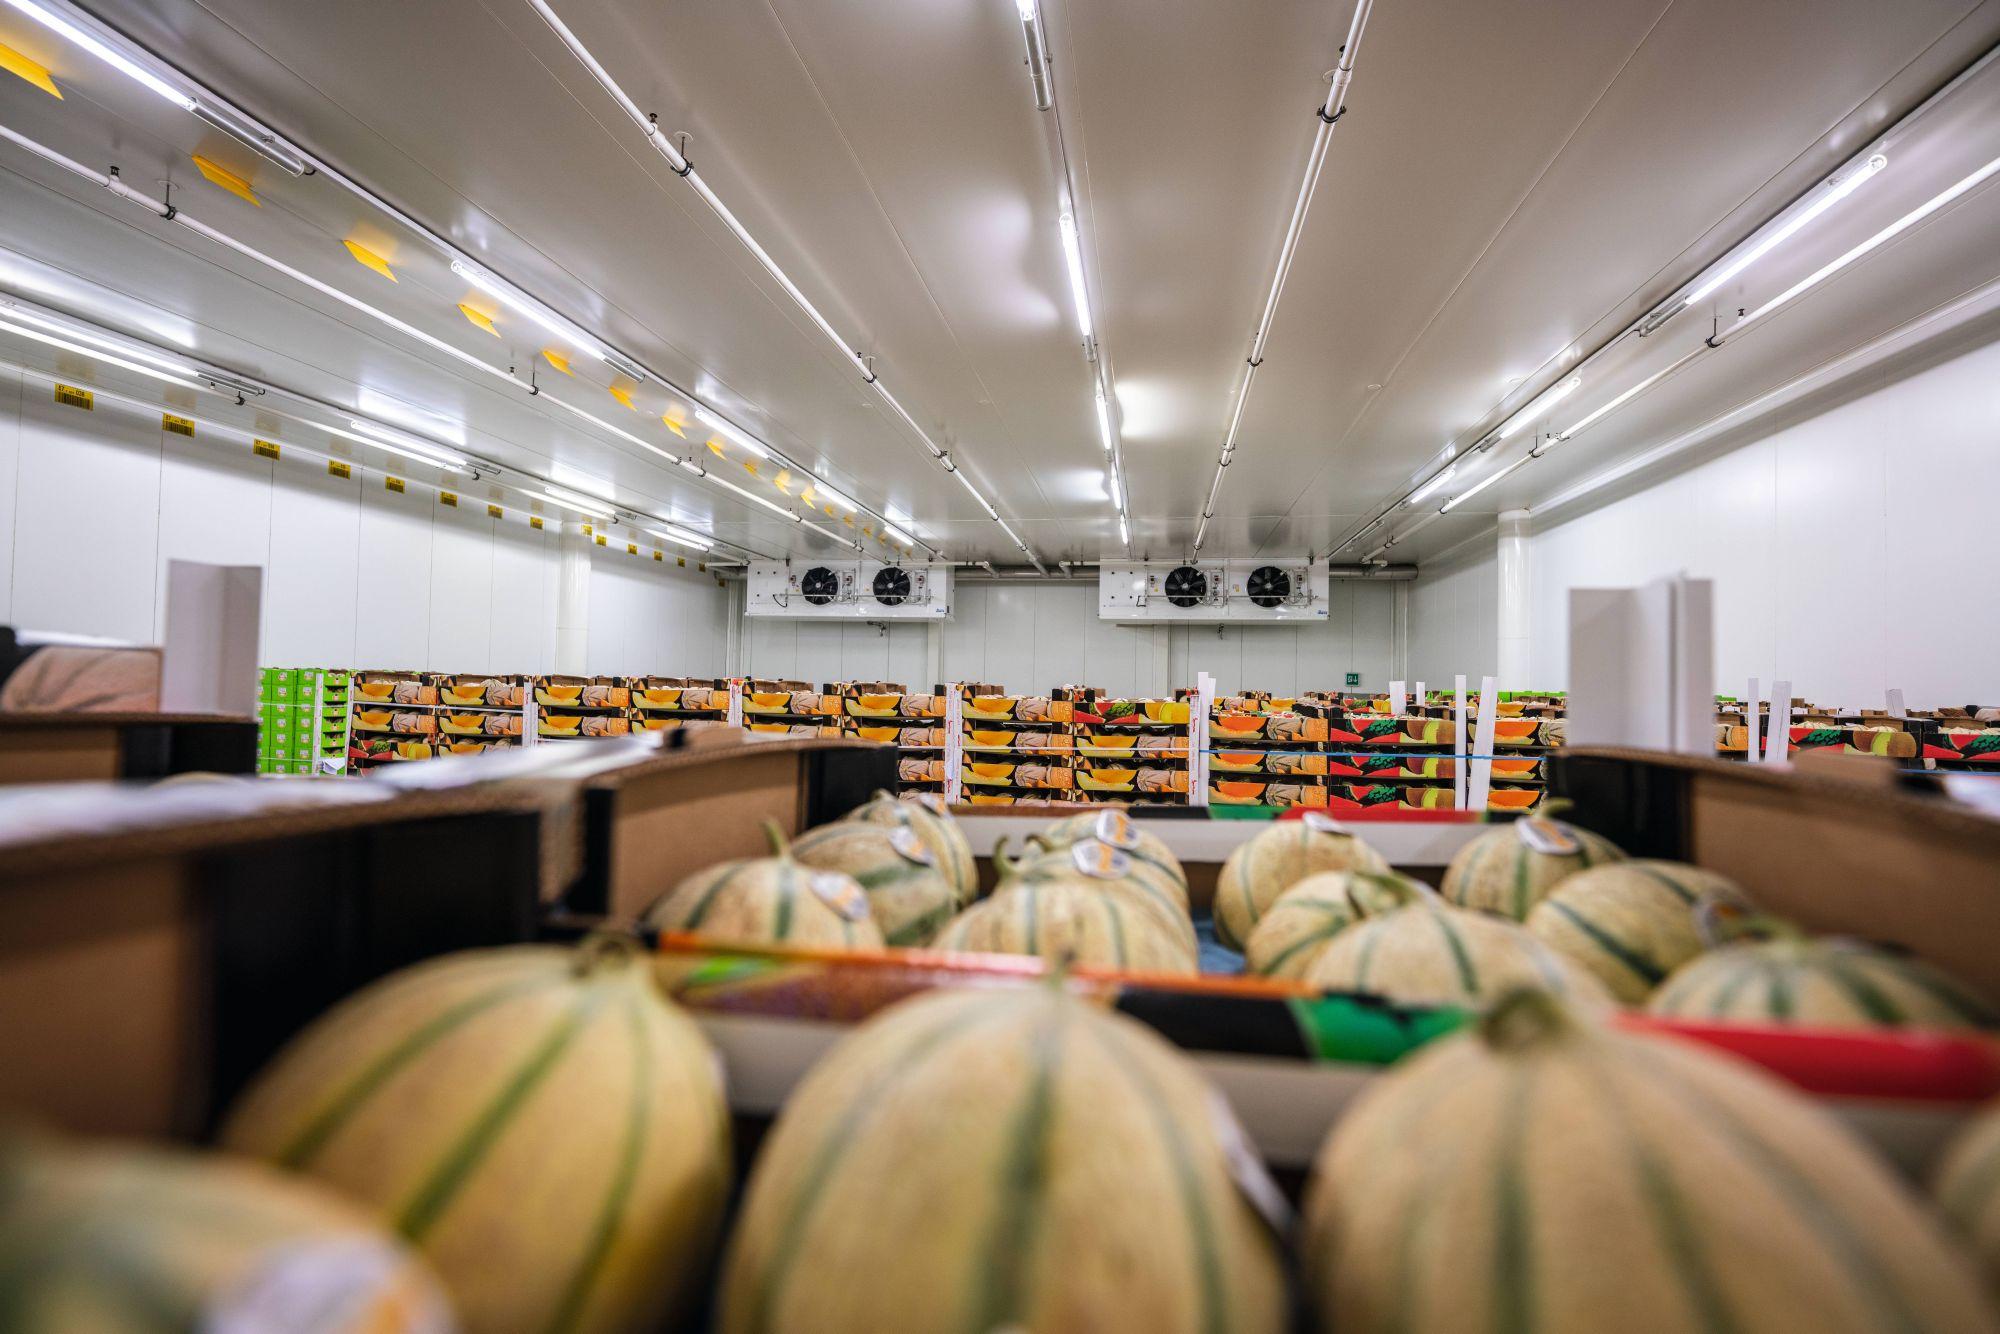 Solution-Application-Food-Distribution-Centers-27.jpg